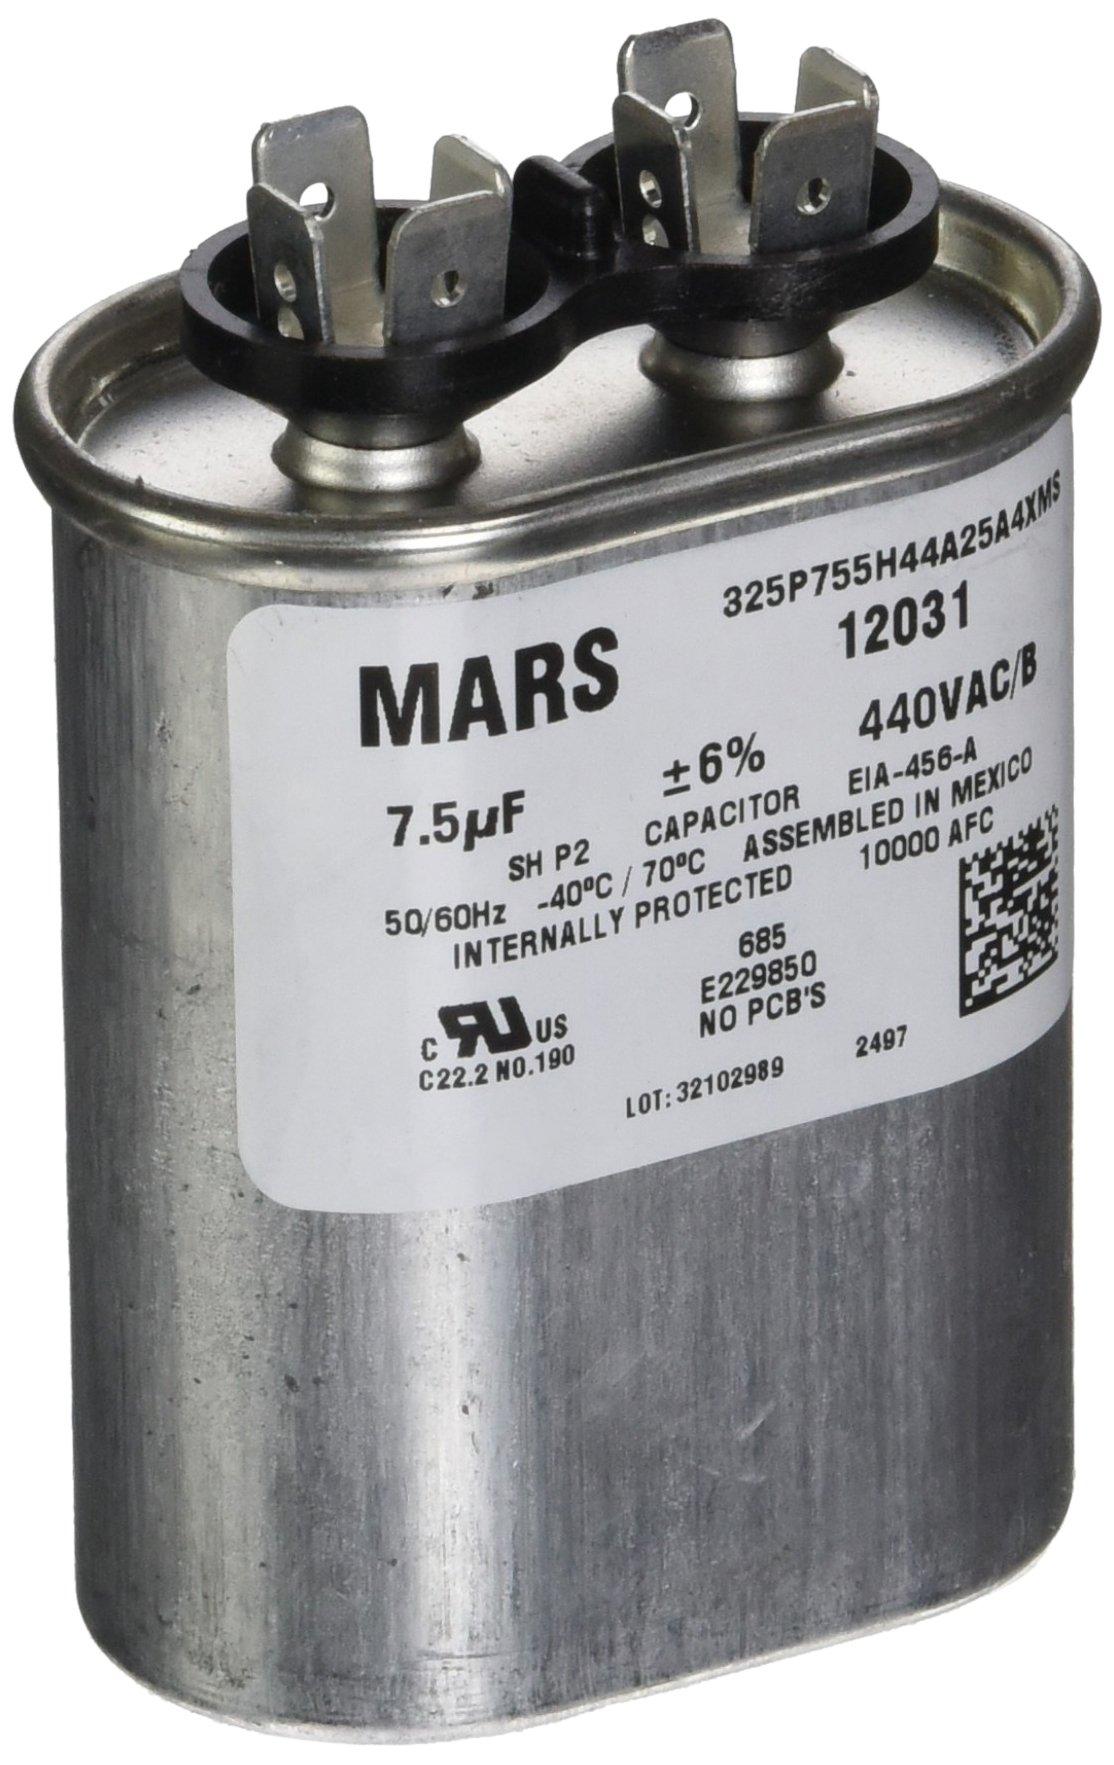 MARS - Motors & Armatures 12031 7.5 Micro-Farad Single Section Run Capacitor, Oval by MARS - Motors & Armatures